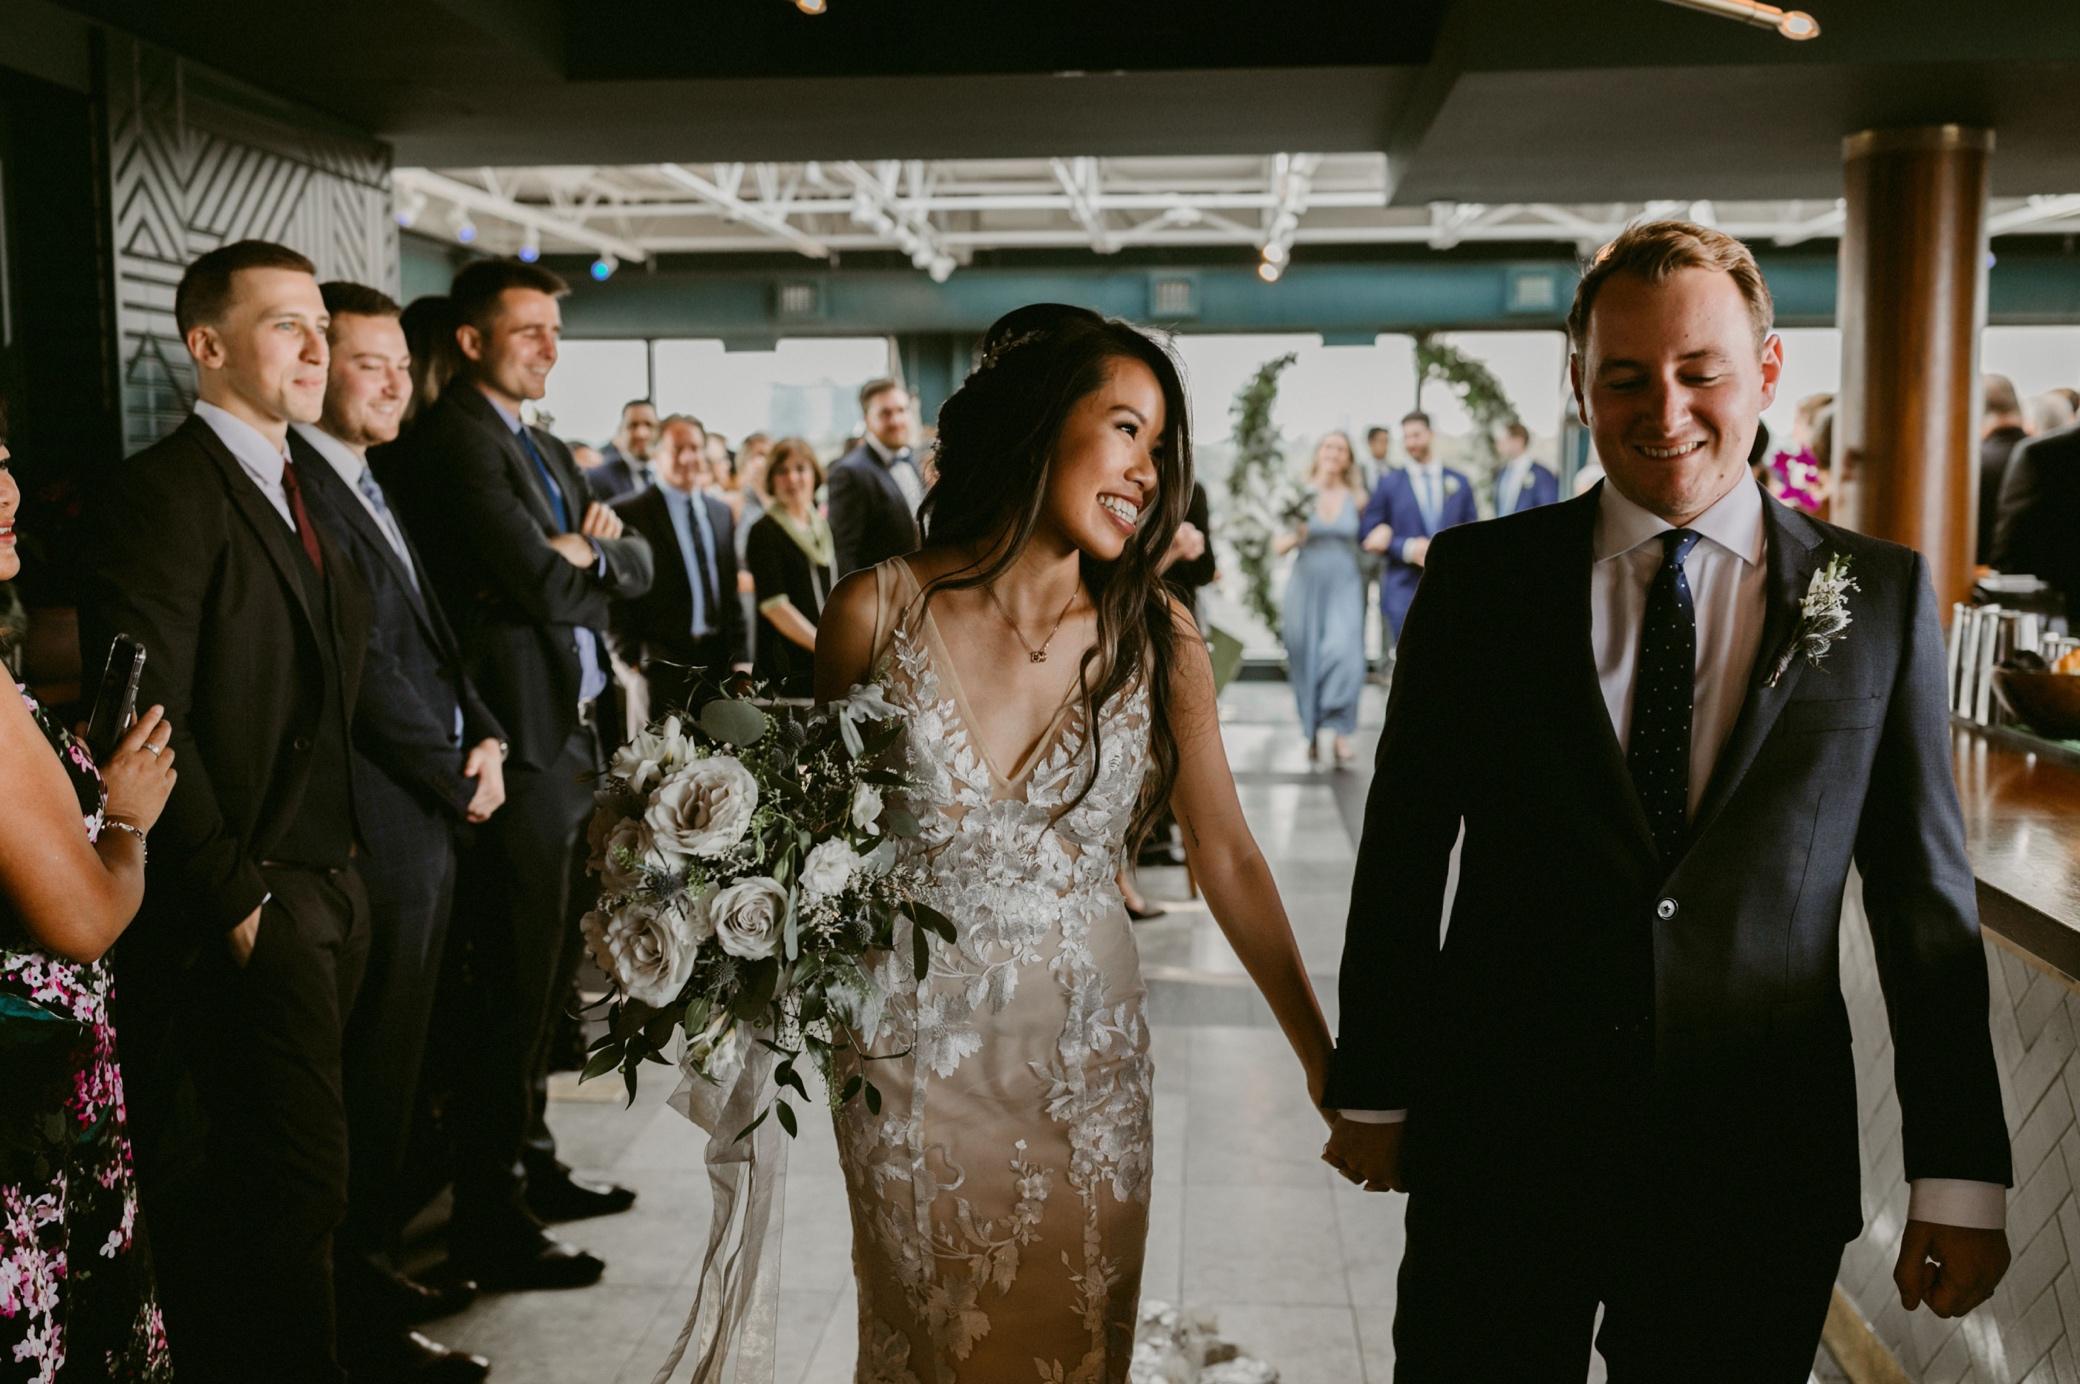 069_The Broadview Hotel Wedding (468 of 913).jpg